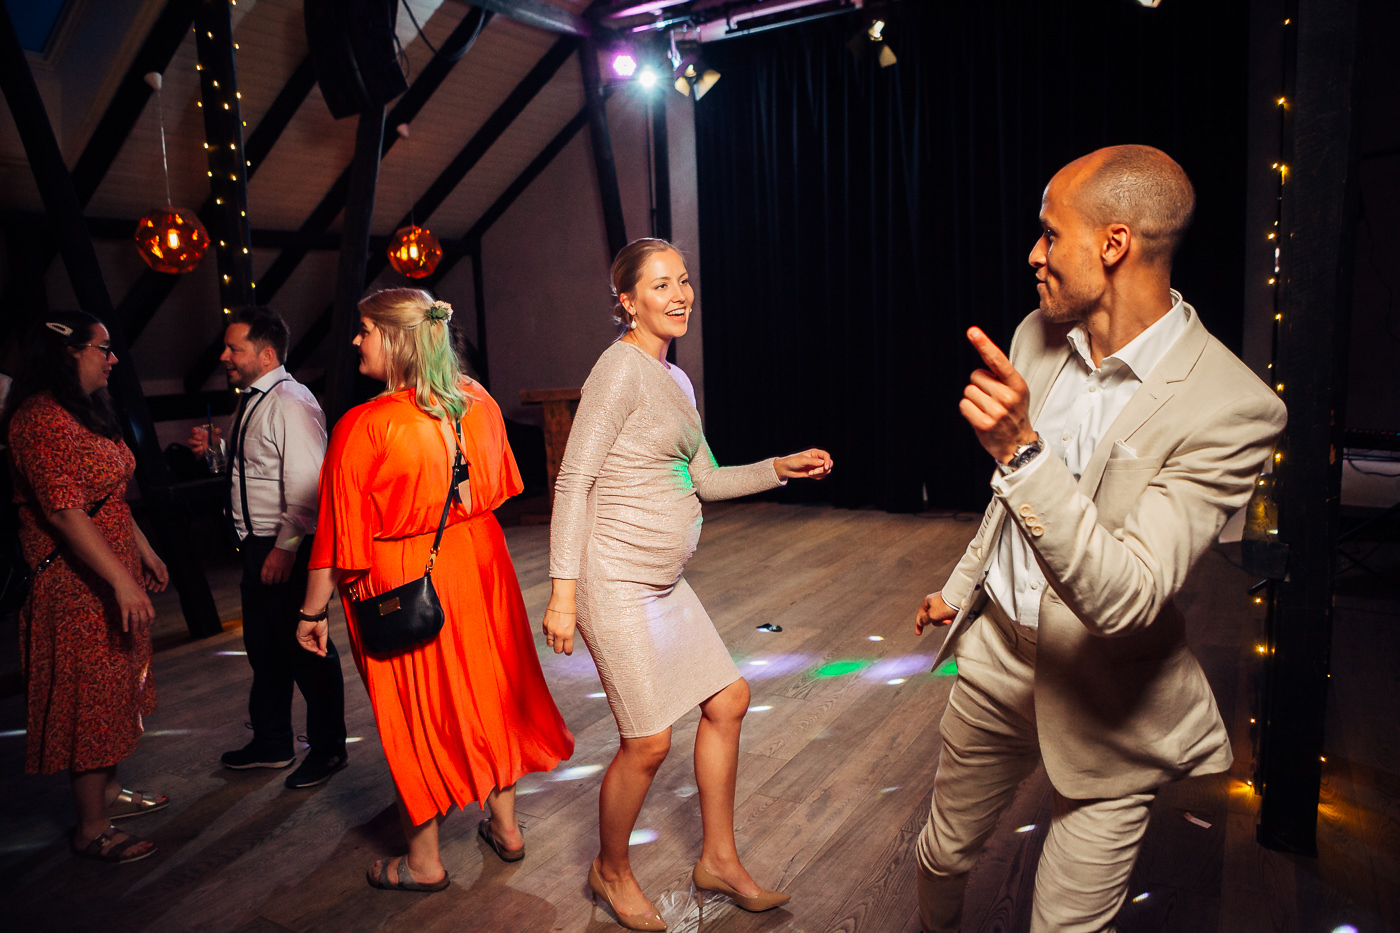 Malene & Ole Martin - elegant dansk- norskt bryllup i Oslo Bryllup Gamle Aker Oslo 4 Akershus